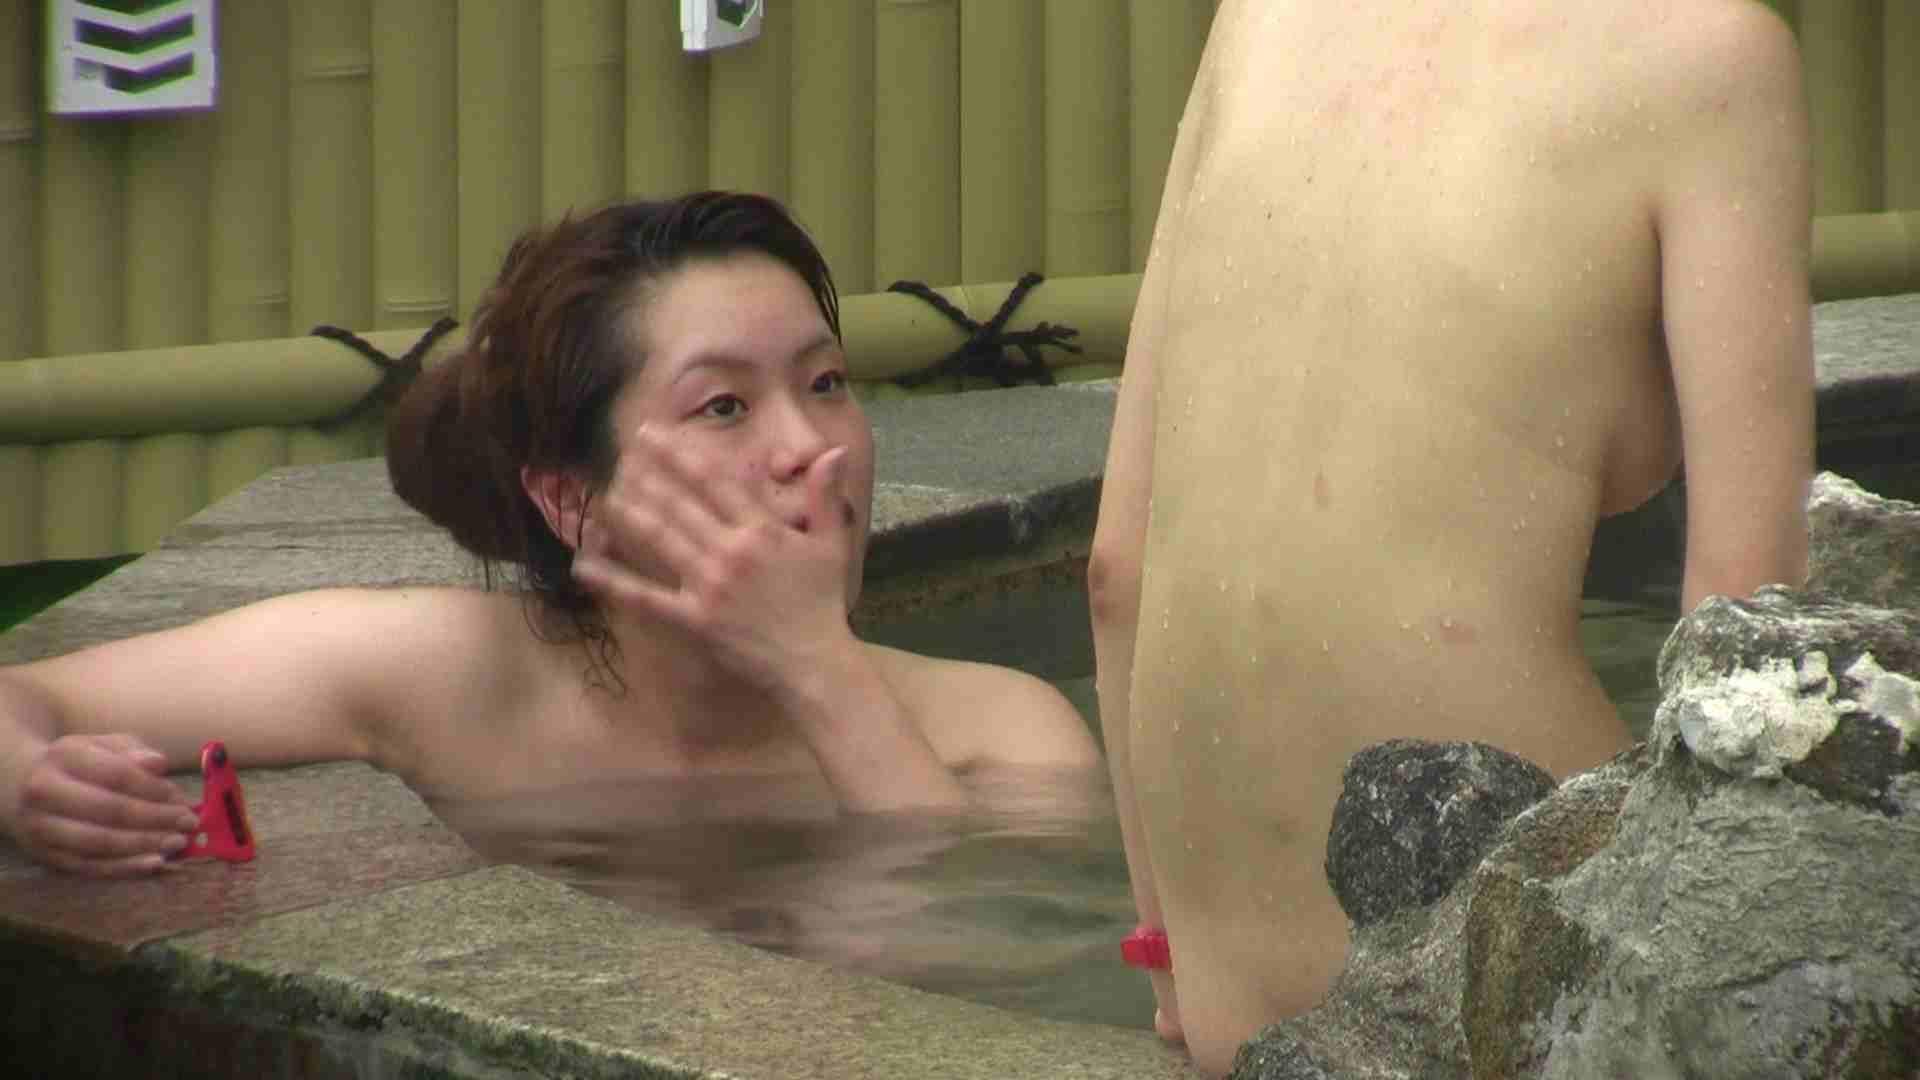 Aquaな露天風呂Vol.680 盗撮特撮   OLのプライベート  13pic 13